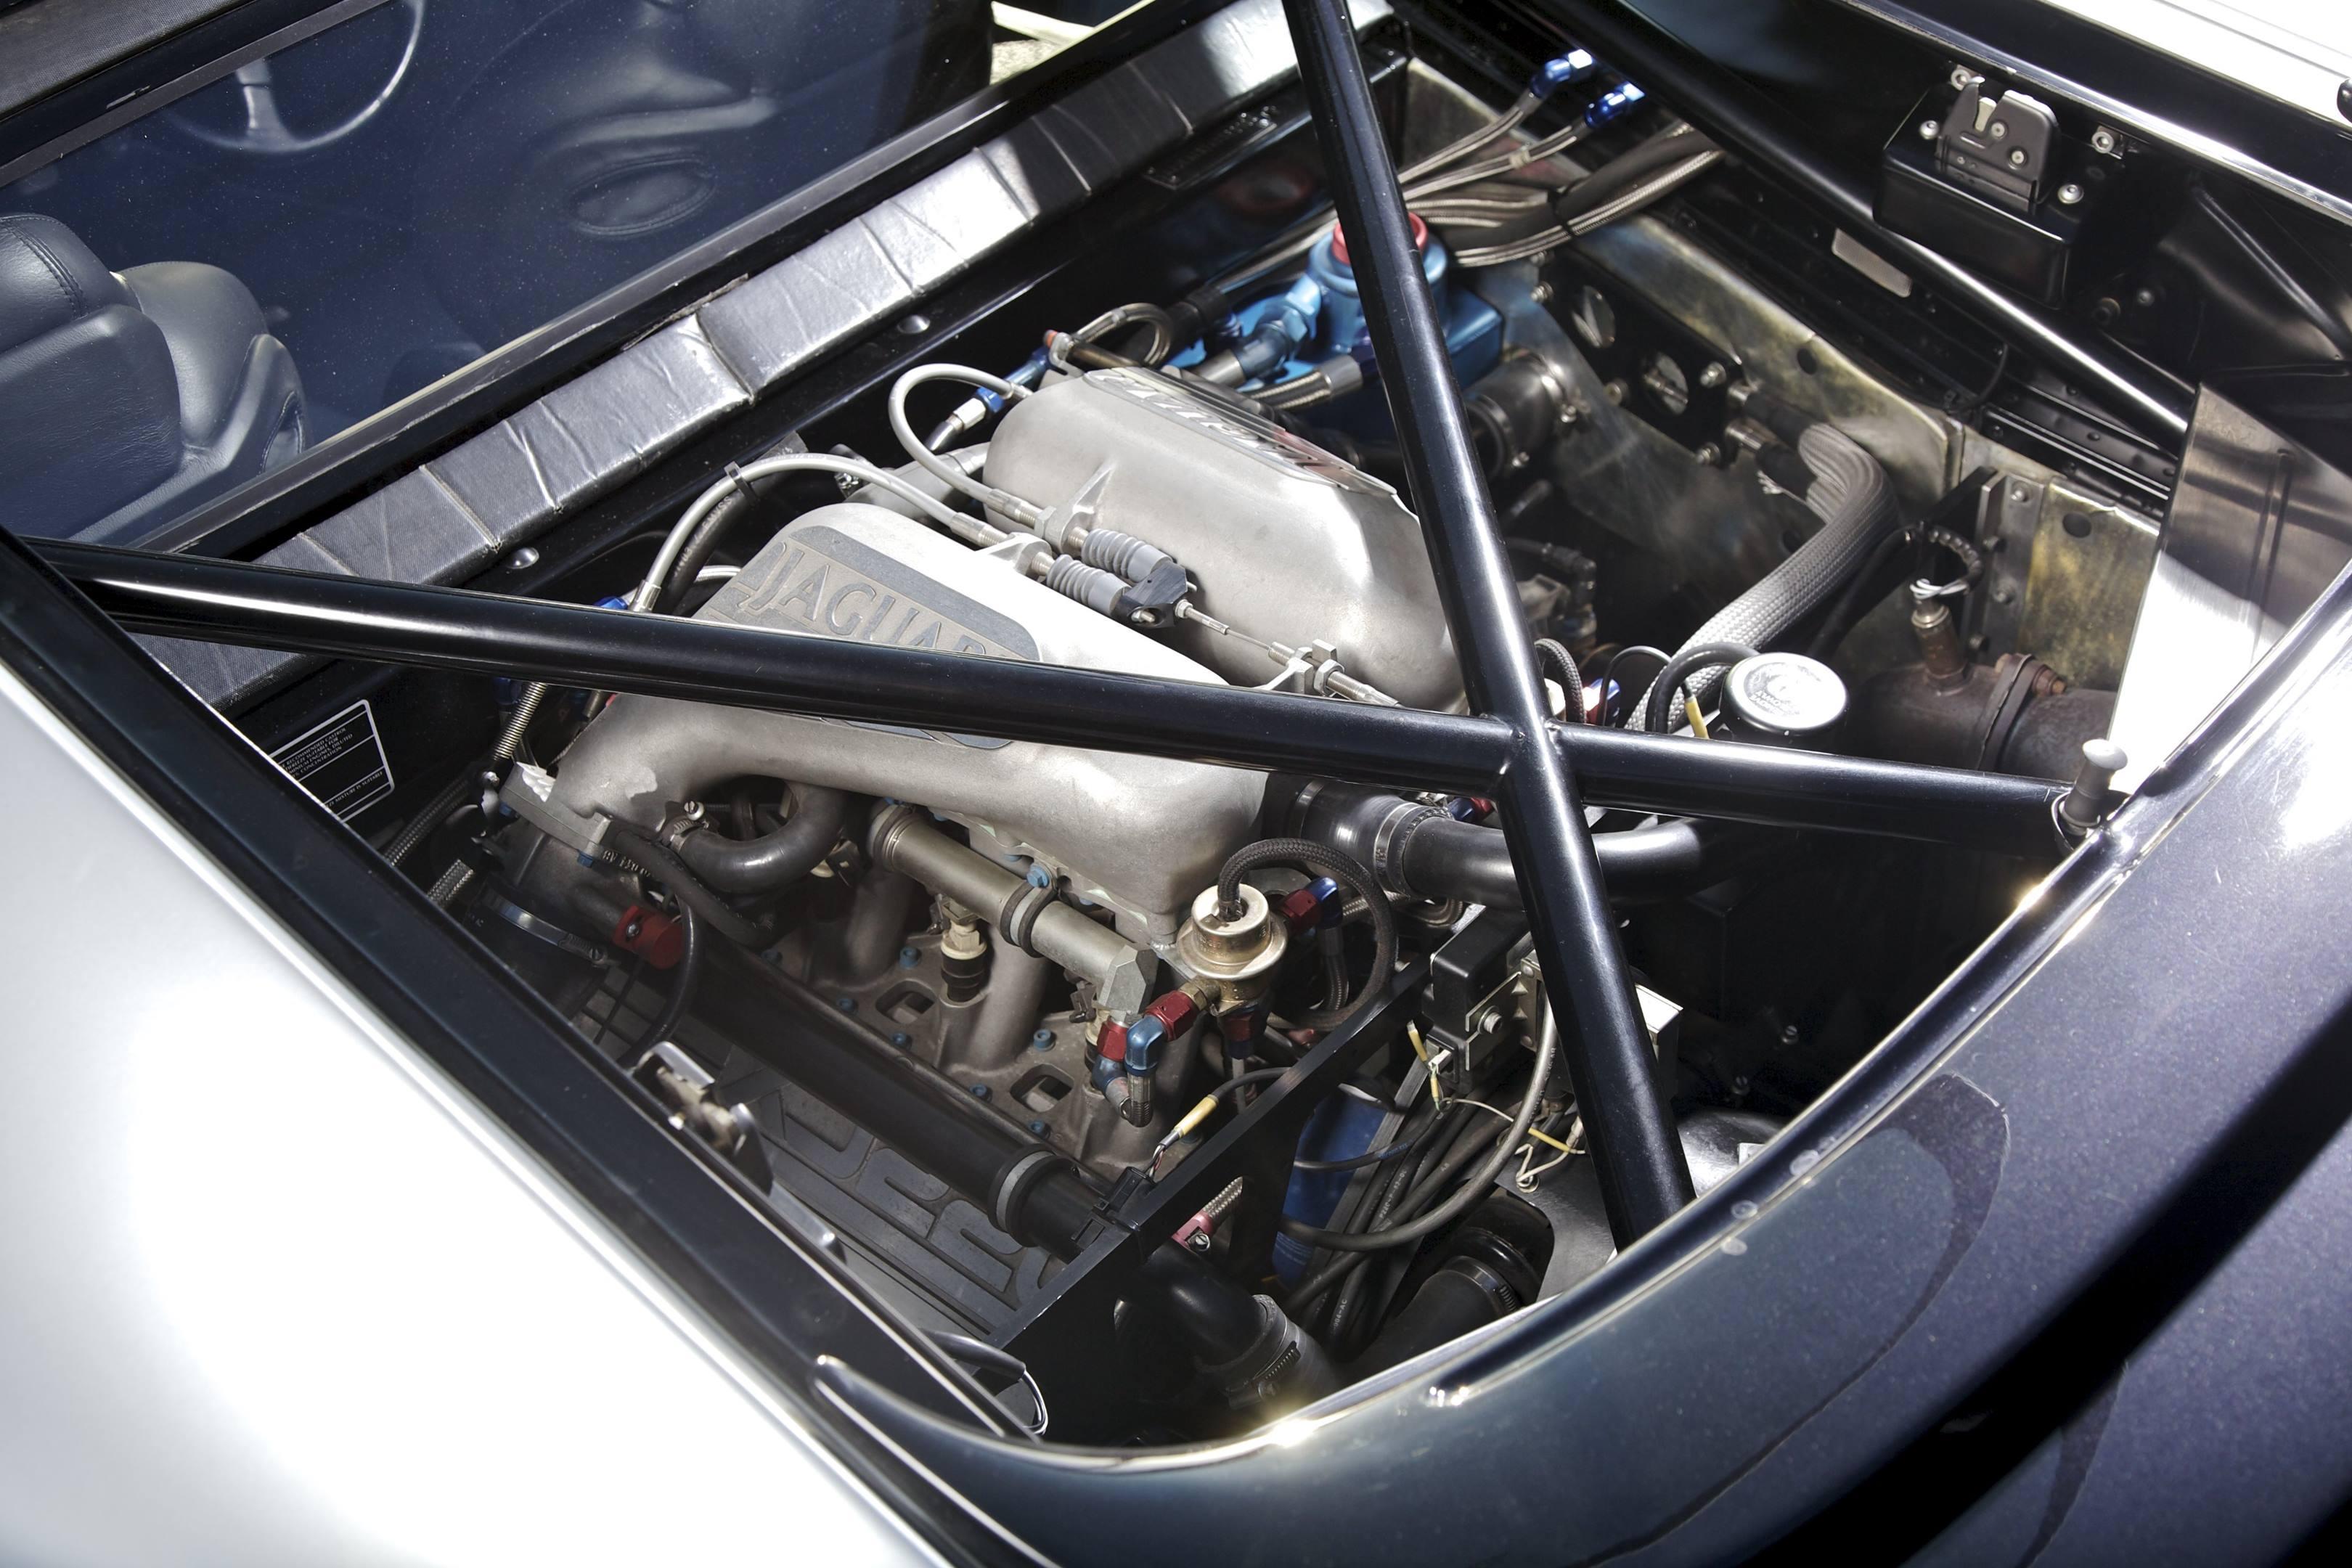 Jaguar XJ220 engine